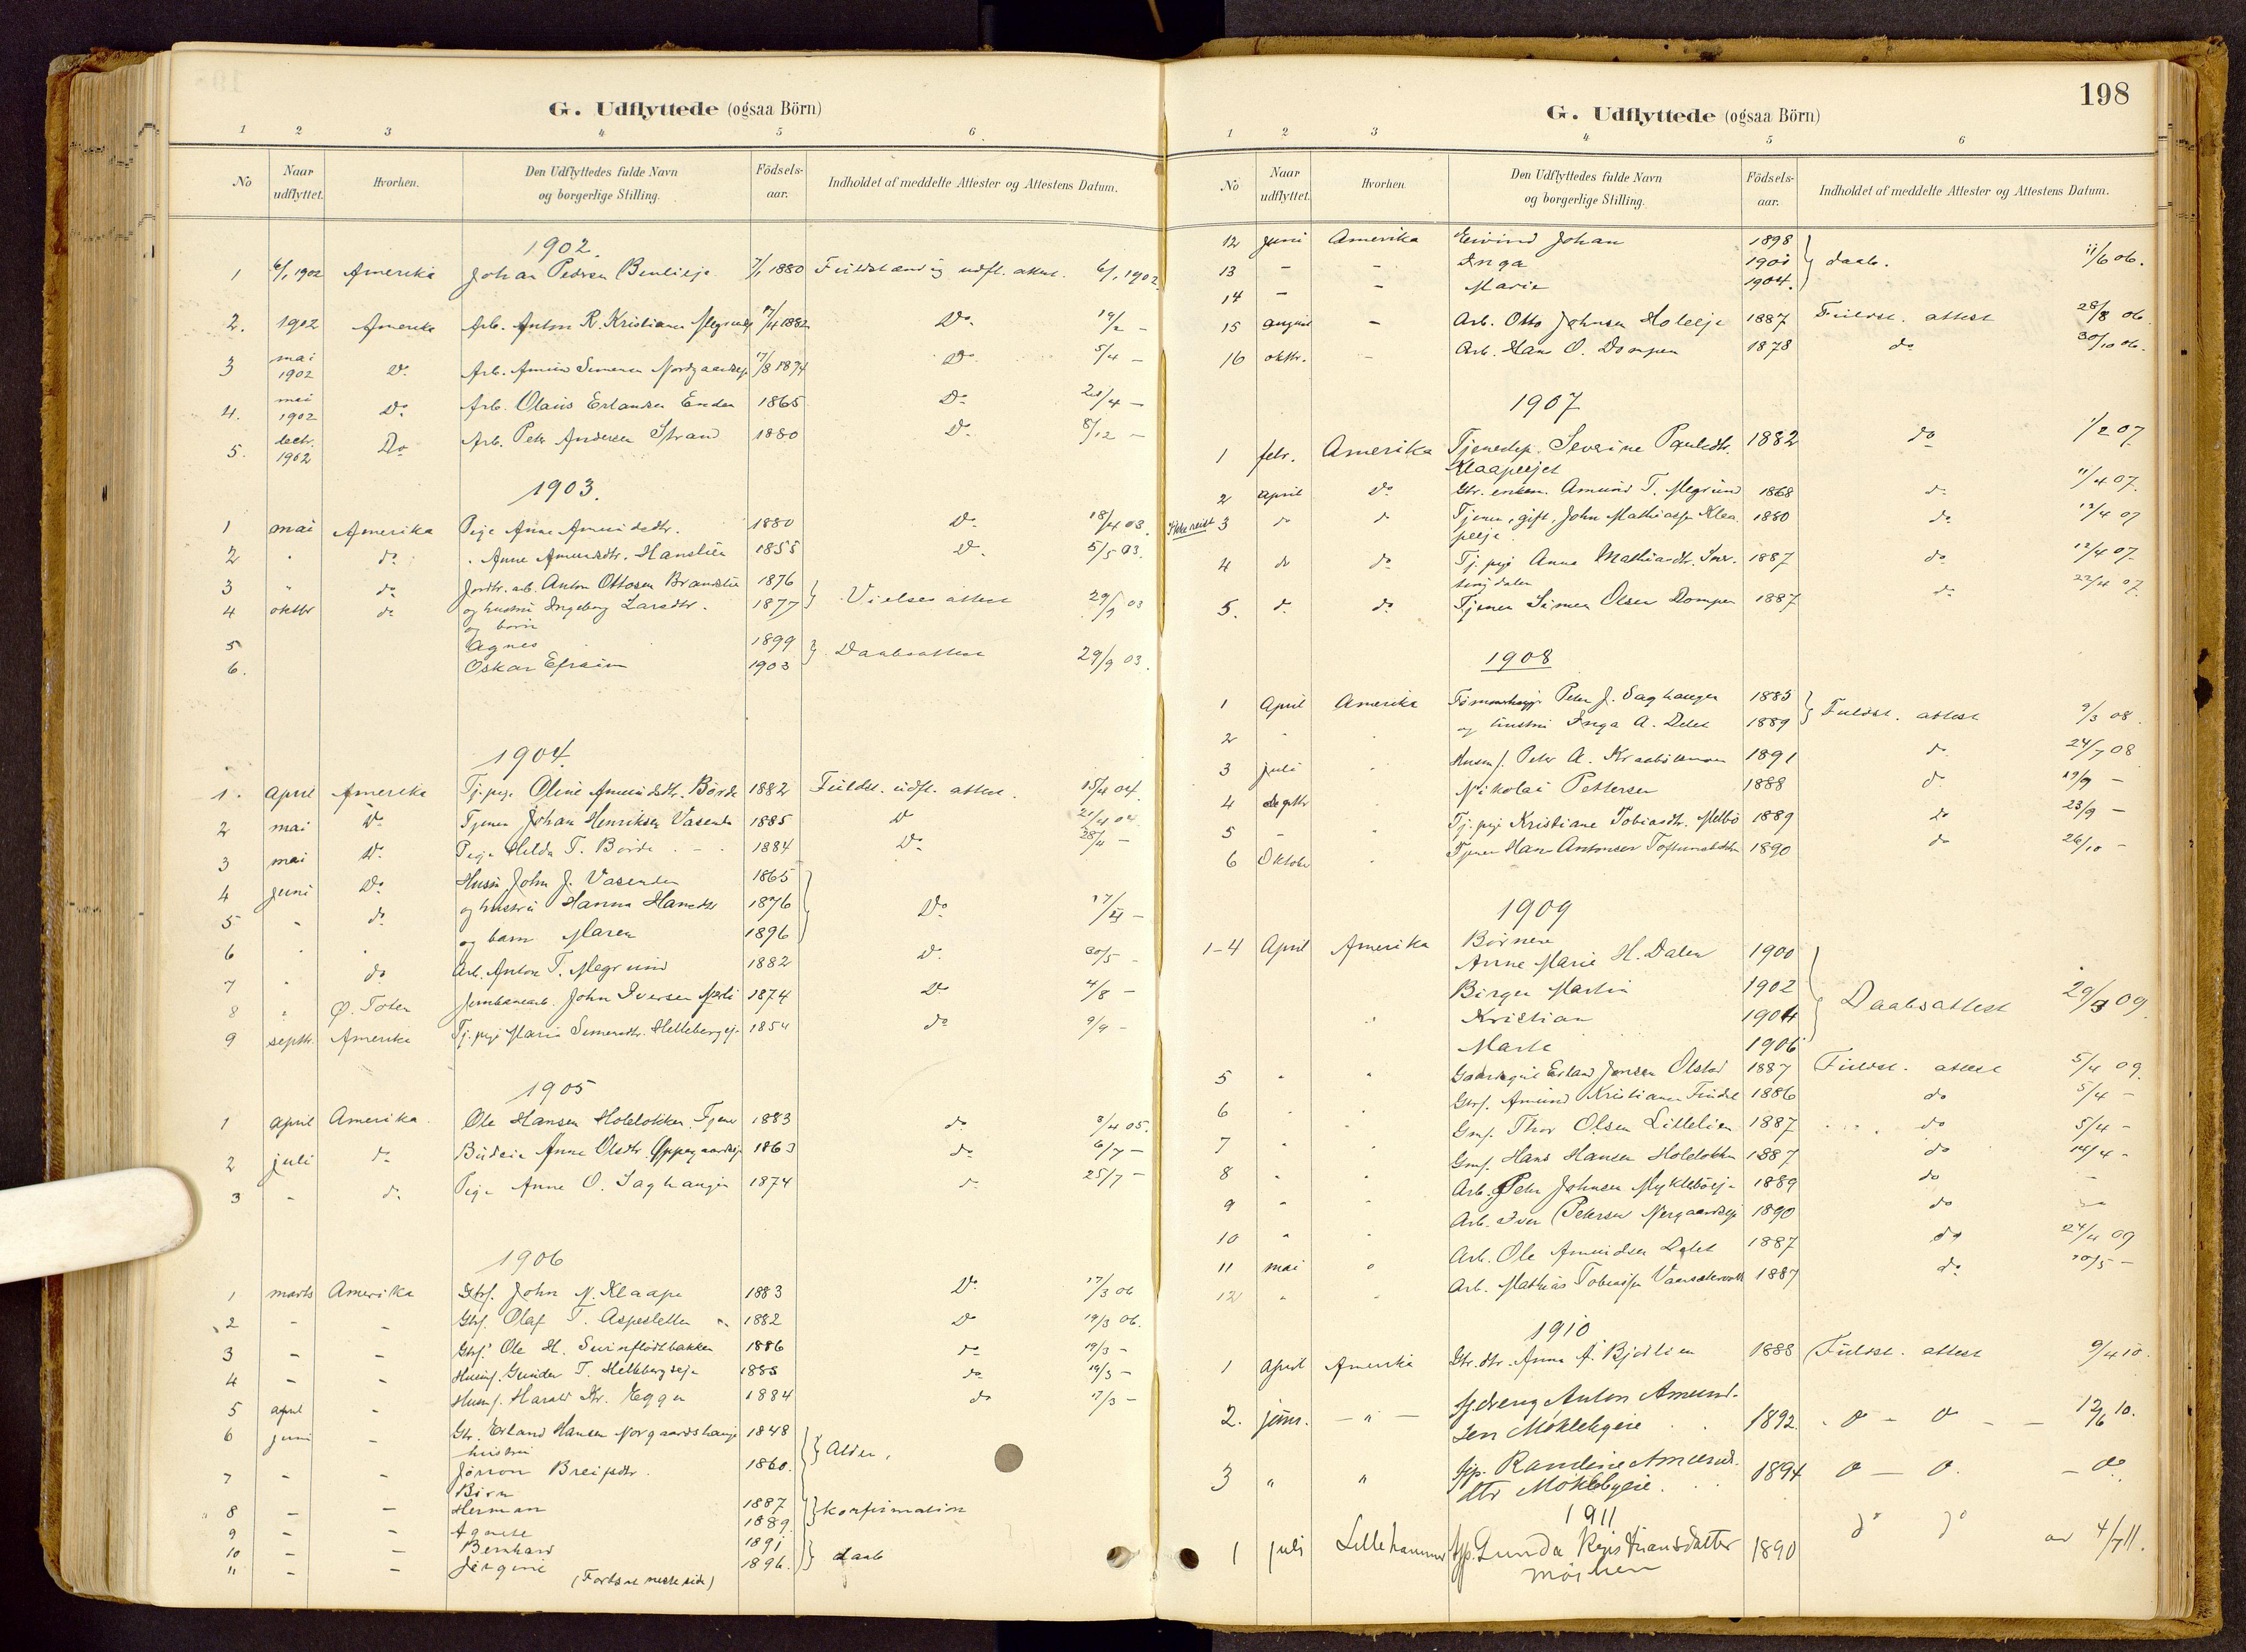 SAH, Vestre Gausdal prestekontor, Ministerialbok nr. 2, 1887-1918, s. 198